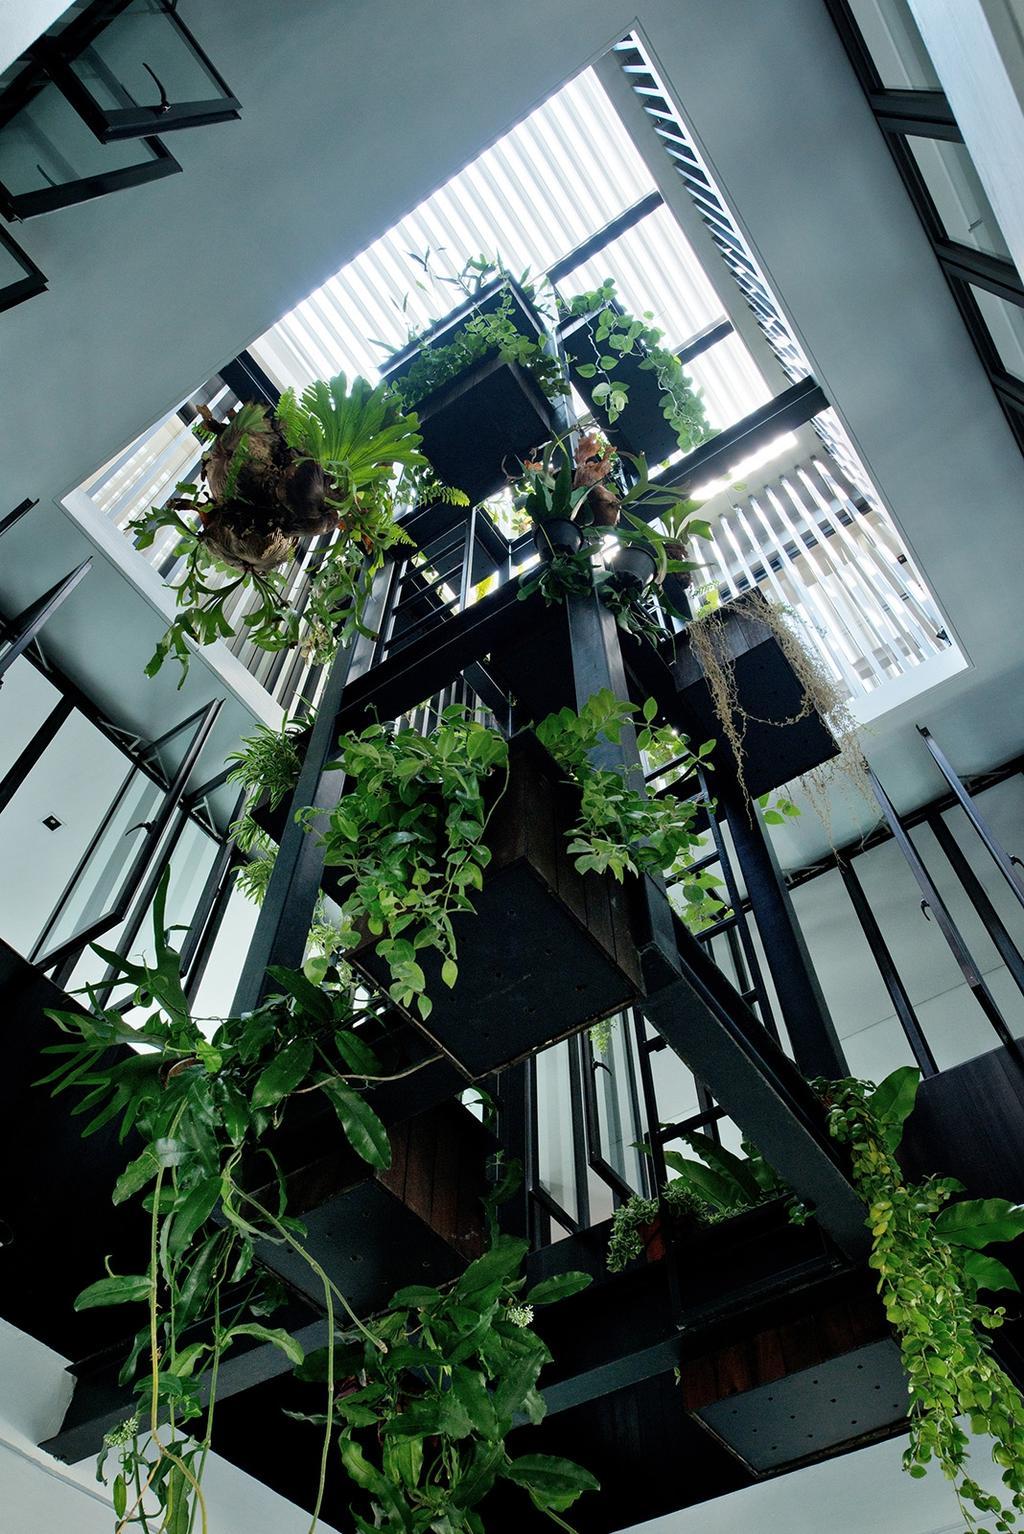 Modern, Landed, Tosca Street, Architect, Kite Studio Architecture, Plants, Lift, Windows, Flora, Jar, Plant, Potted Plant, Pottery, Vase, Vine, Ivy